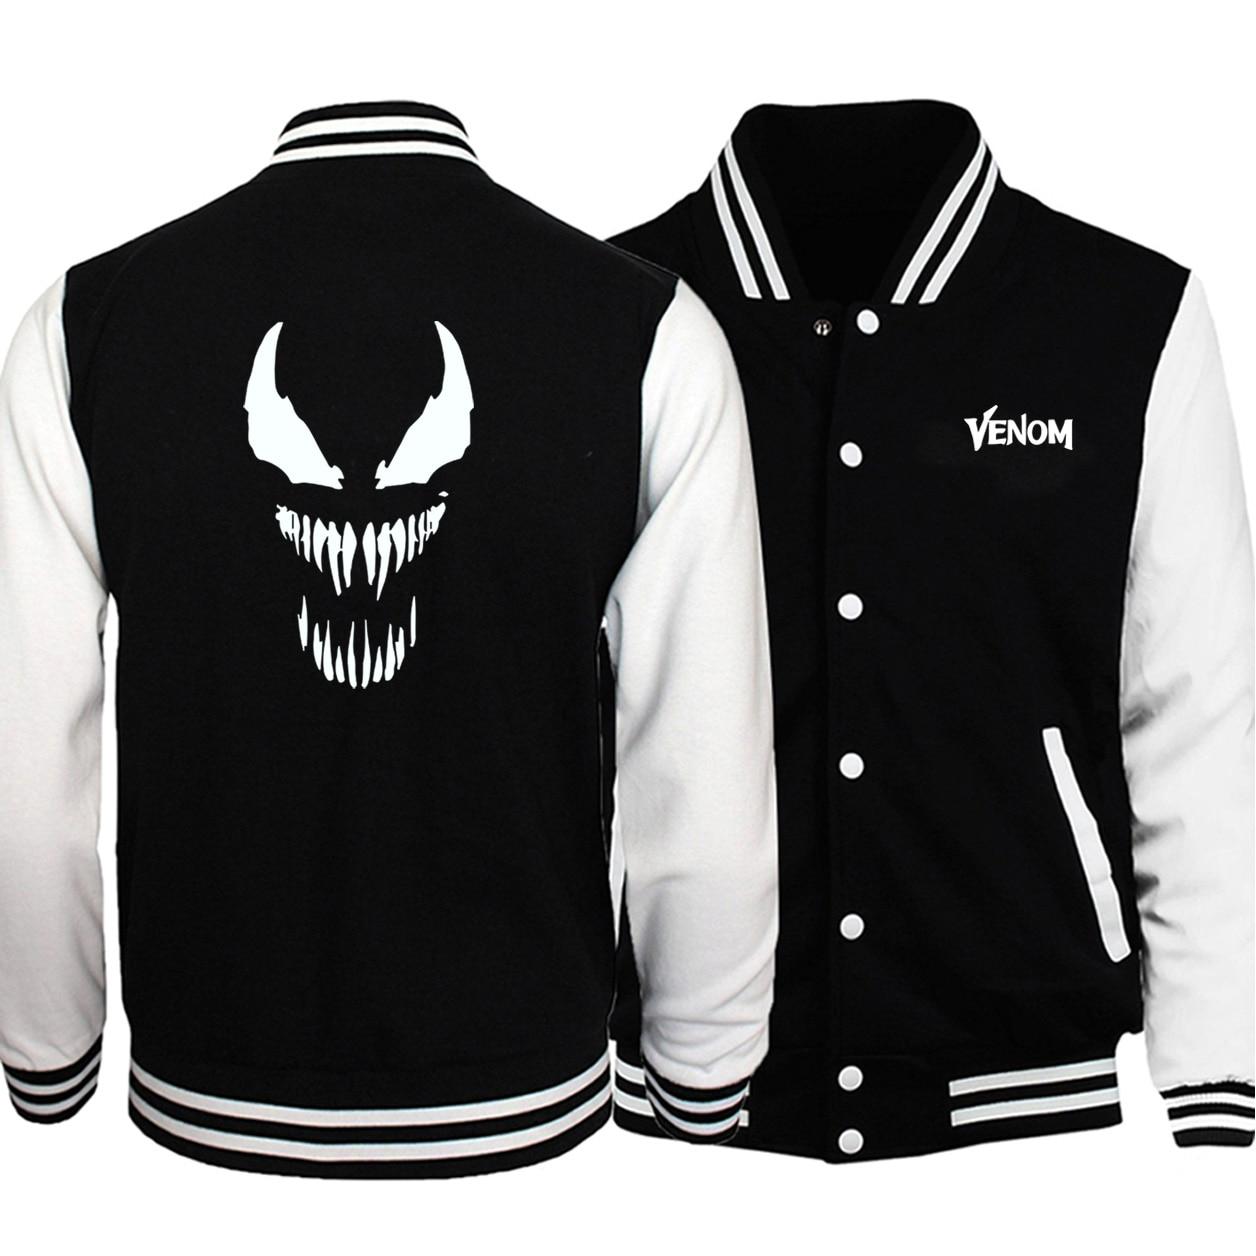 2020 New Arrival Venom Print Superhero Men Jackets Game Of Thrones Baseball Jackets Men Casual Hoodies Men Fashion Hip Hop Warm